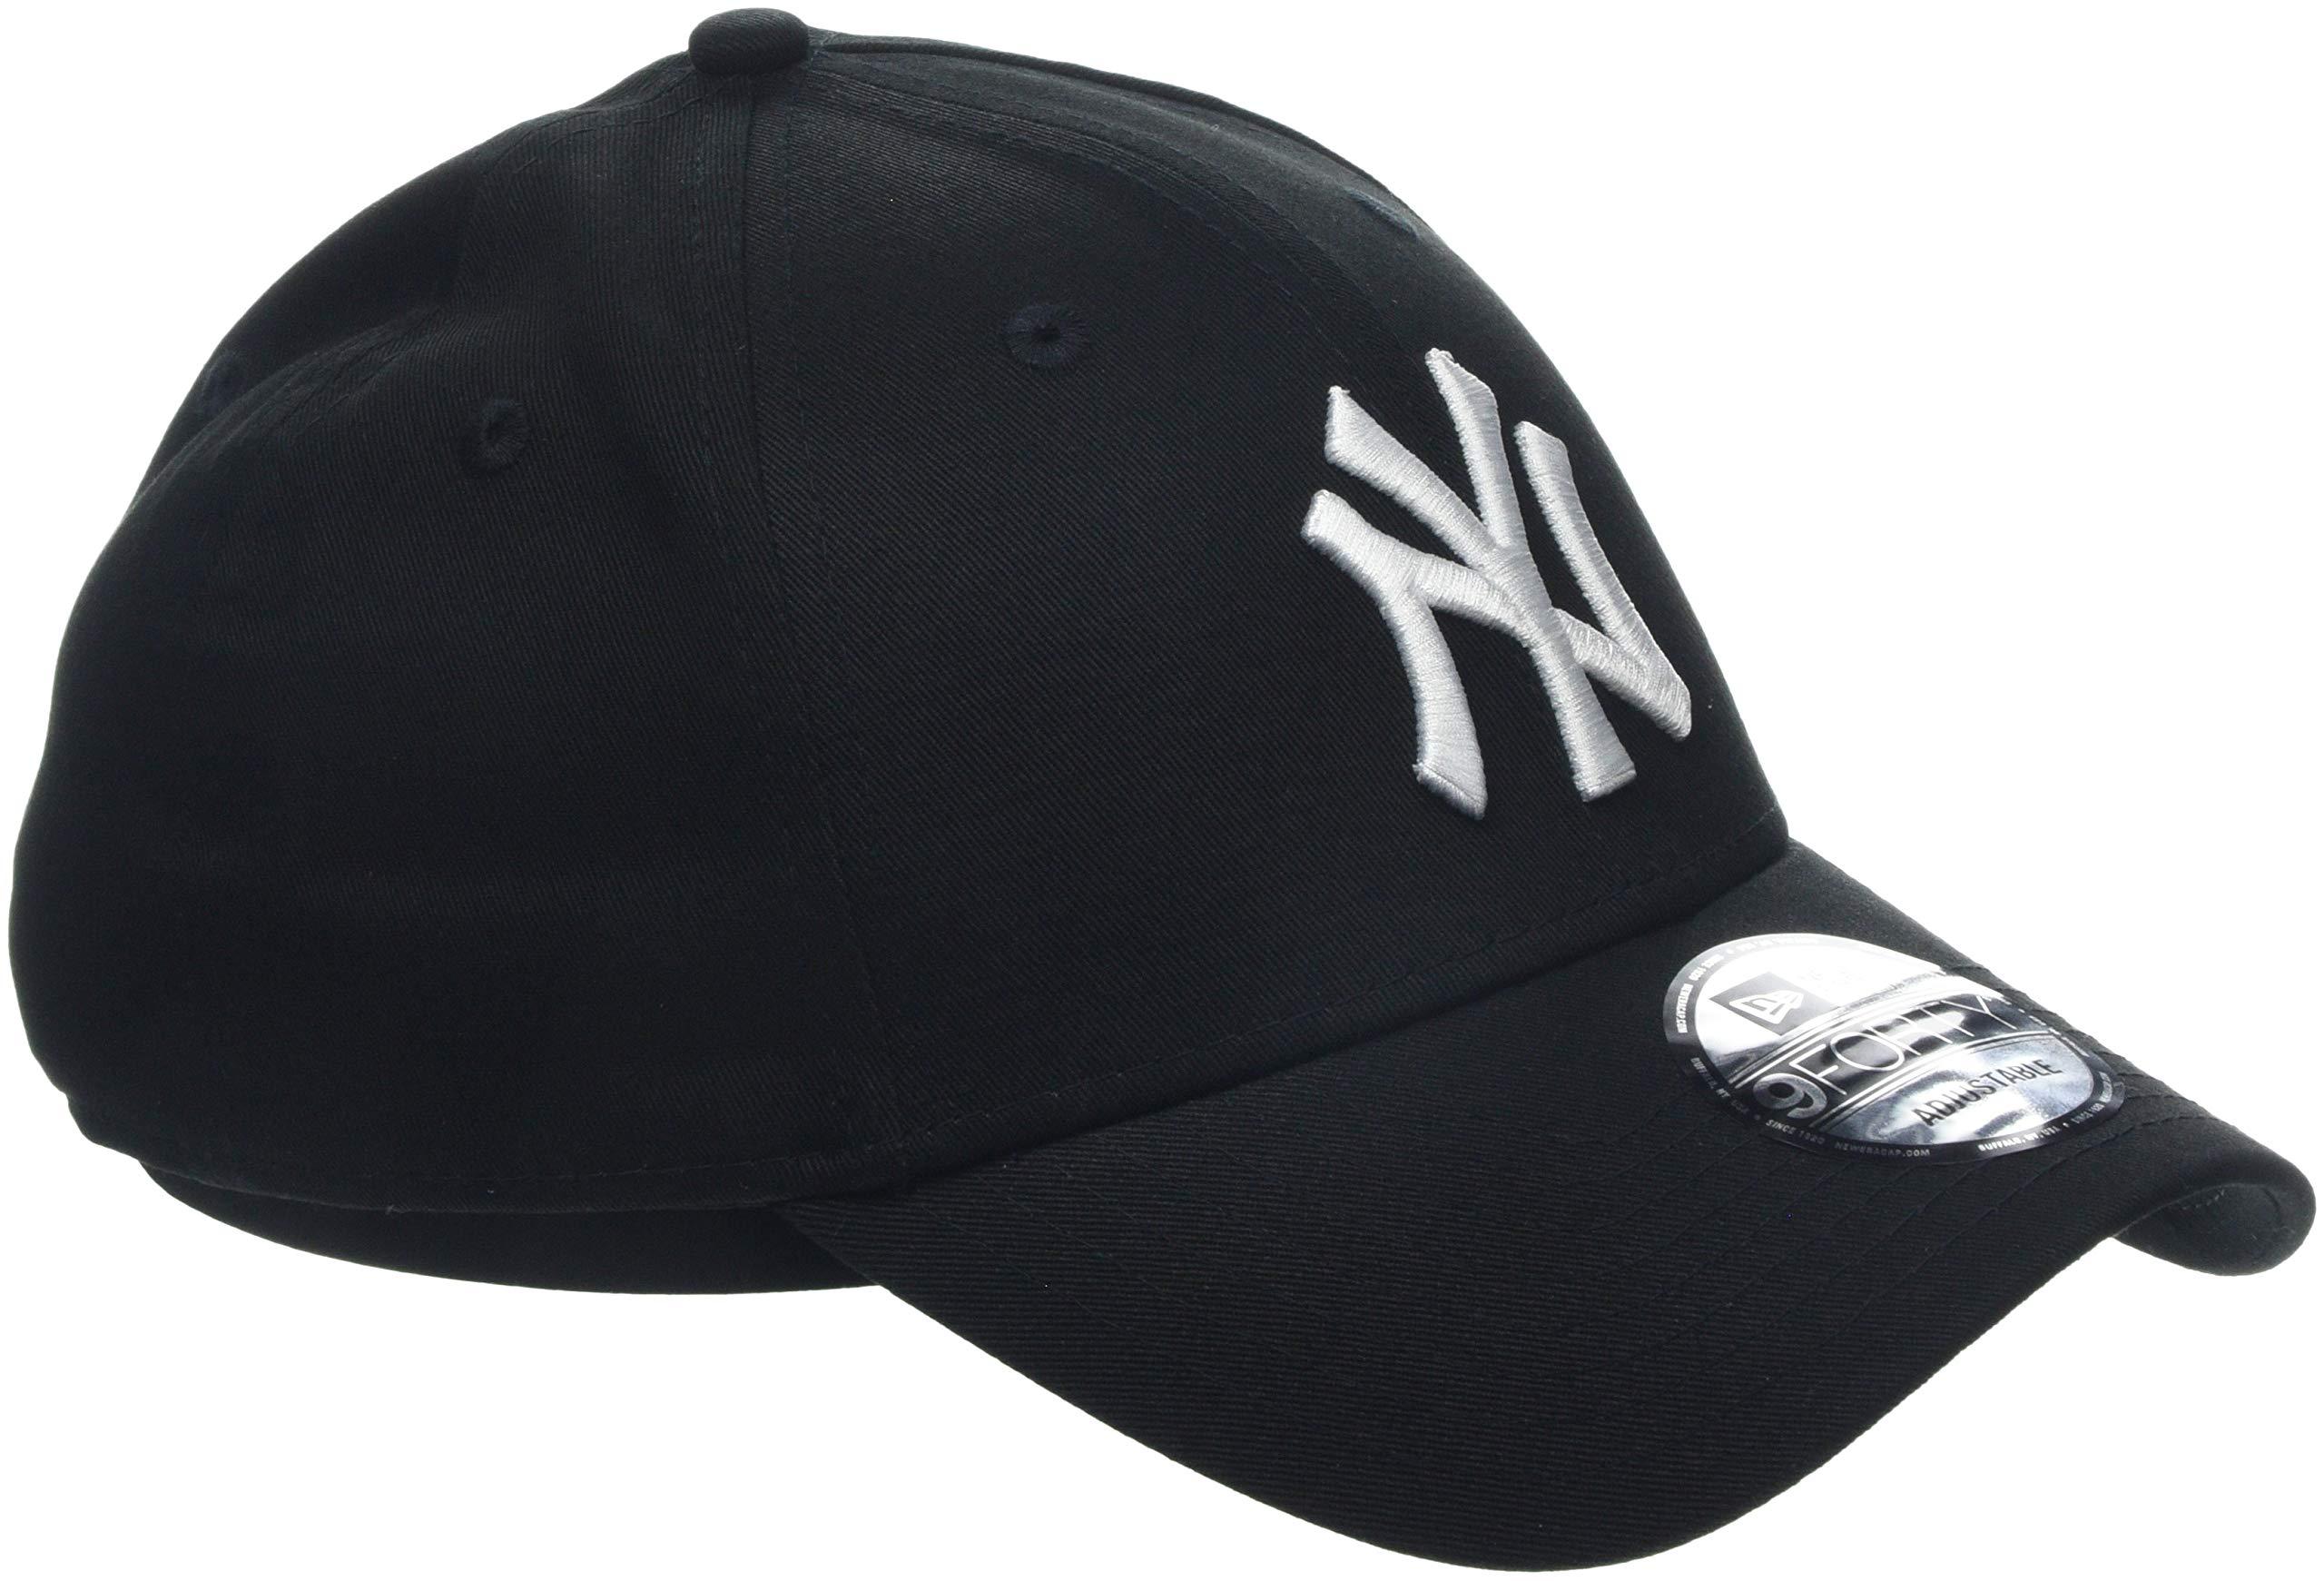 I piu votati nella categoria Cappellini da baseball da uomo ... c7c87ce4c09b